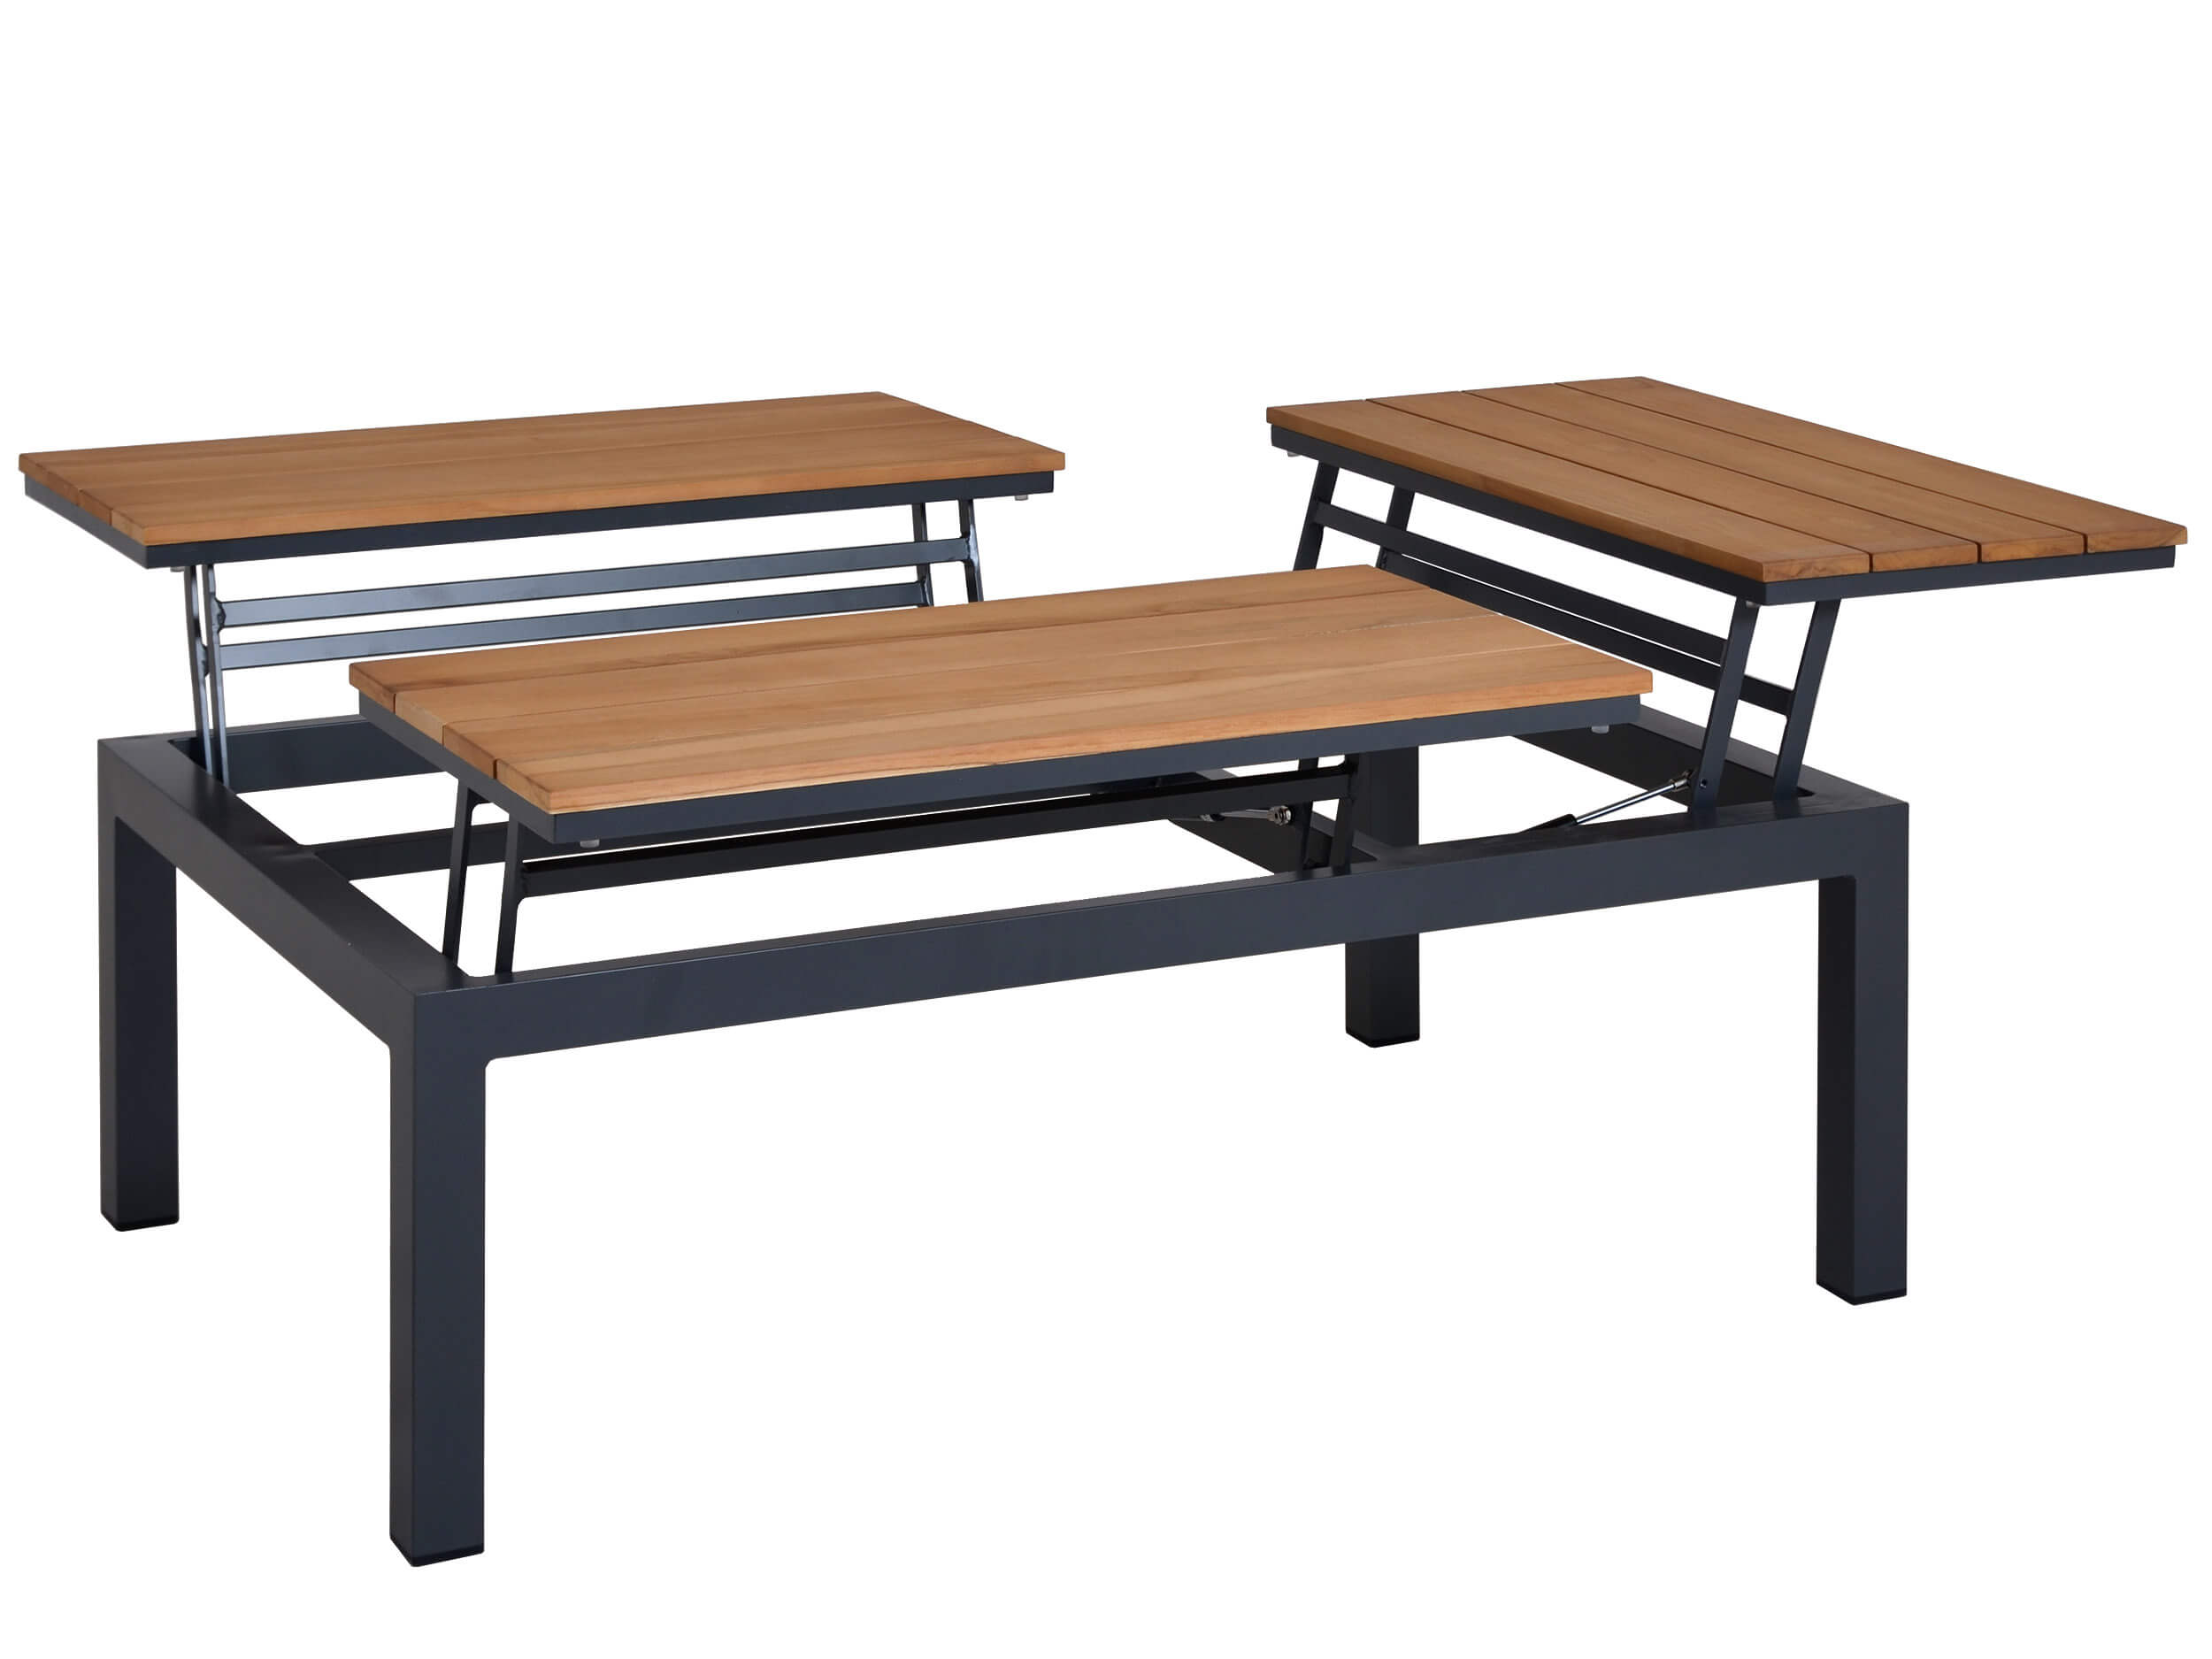 Full Size of Aluminium Loungembel Valencia Tisch Flip Up Teak Gartenmbel Lnse Garten Loungemöbel Günstig Verbundplatte Küche Fenster Holz Wohnzimmer Loungemöbel Aluminium